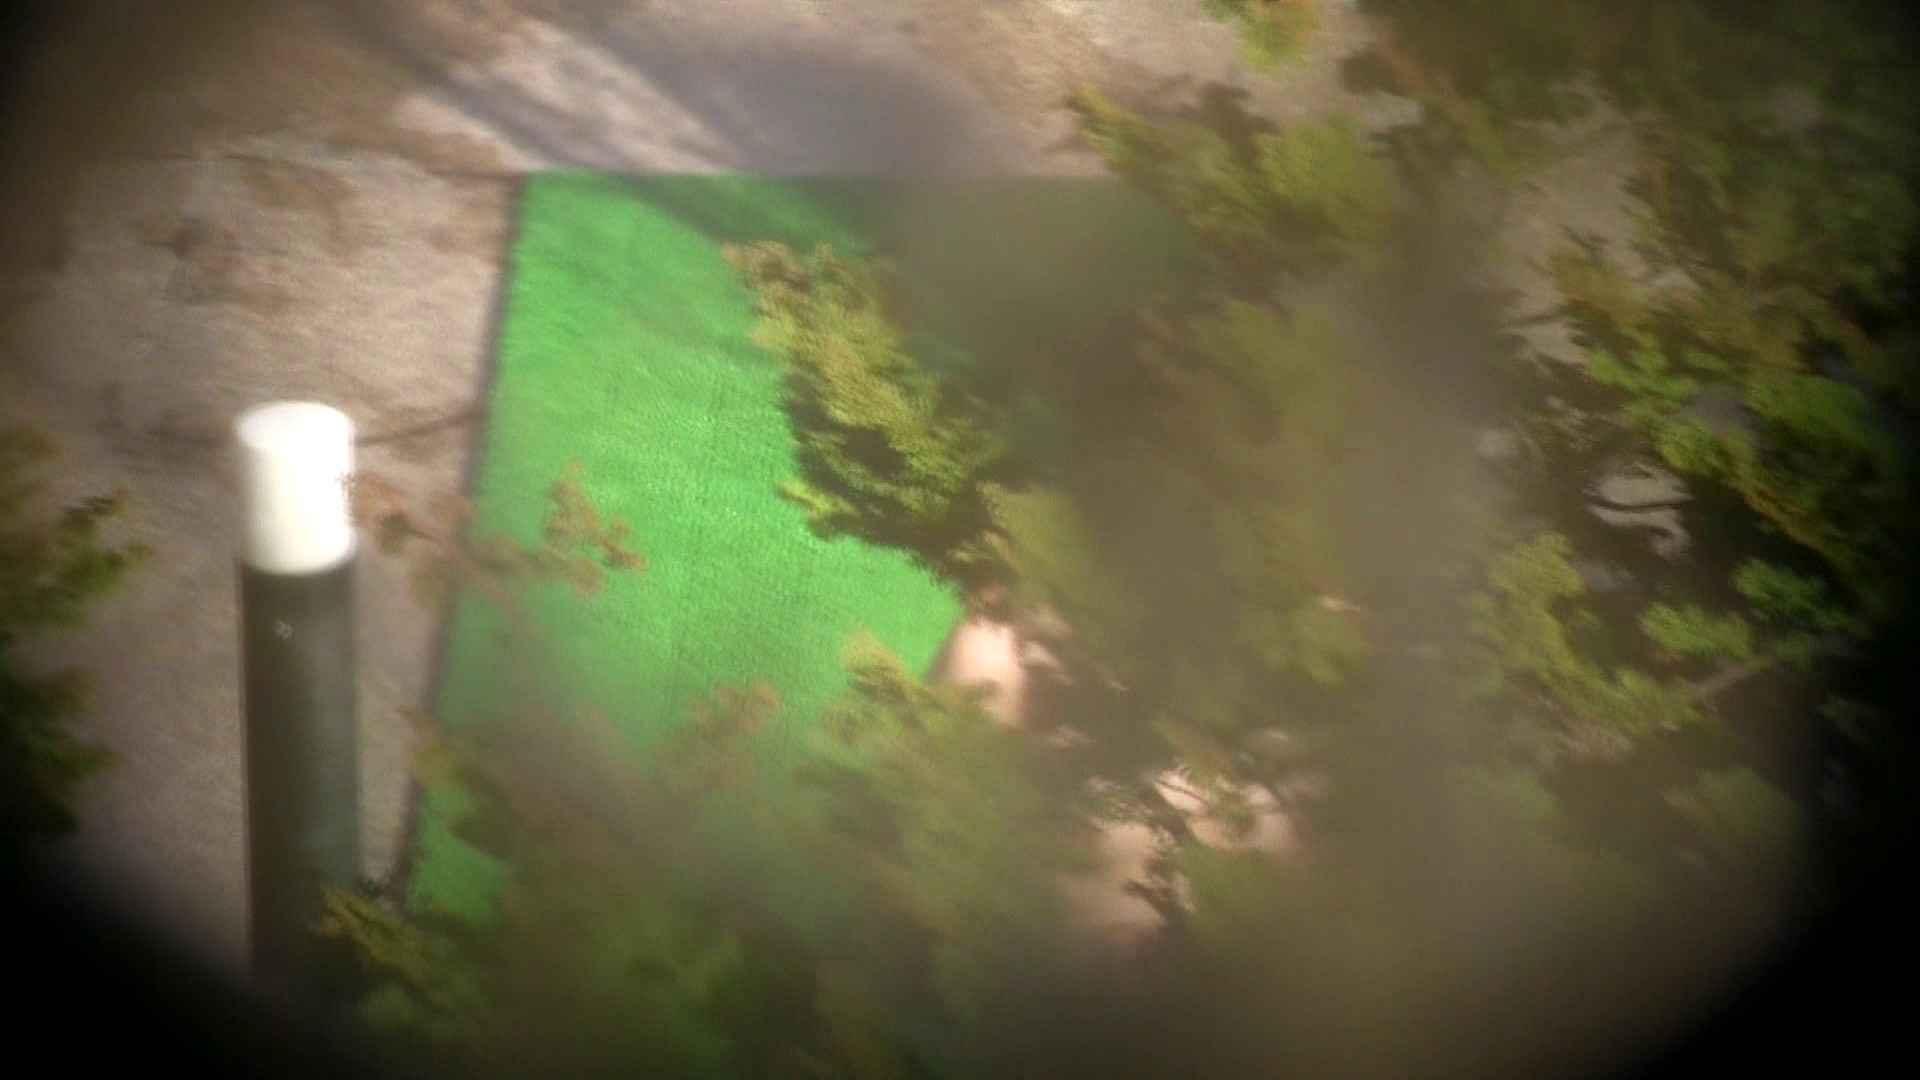 Aquaな露天風呂Vol.698 美しいOLの裸体 われめAV動画紹介 104pic 8